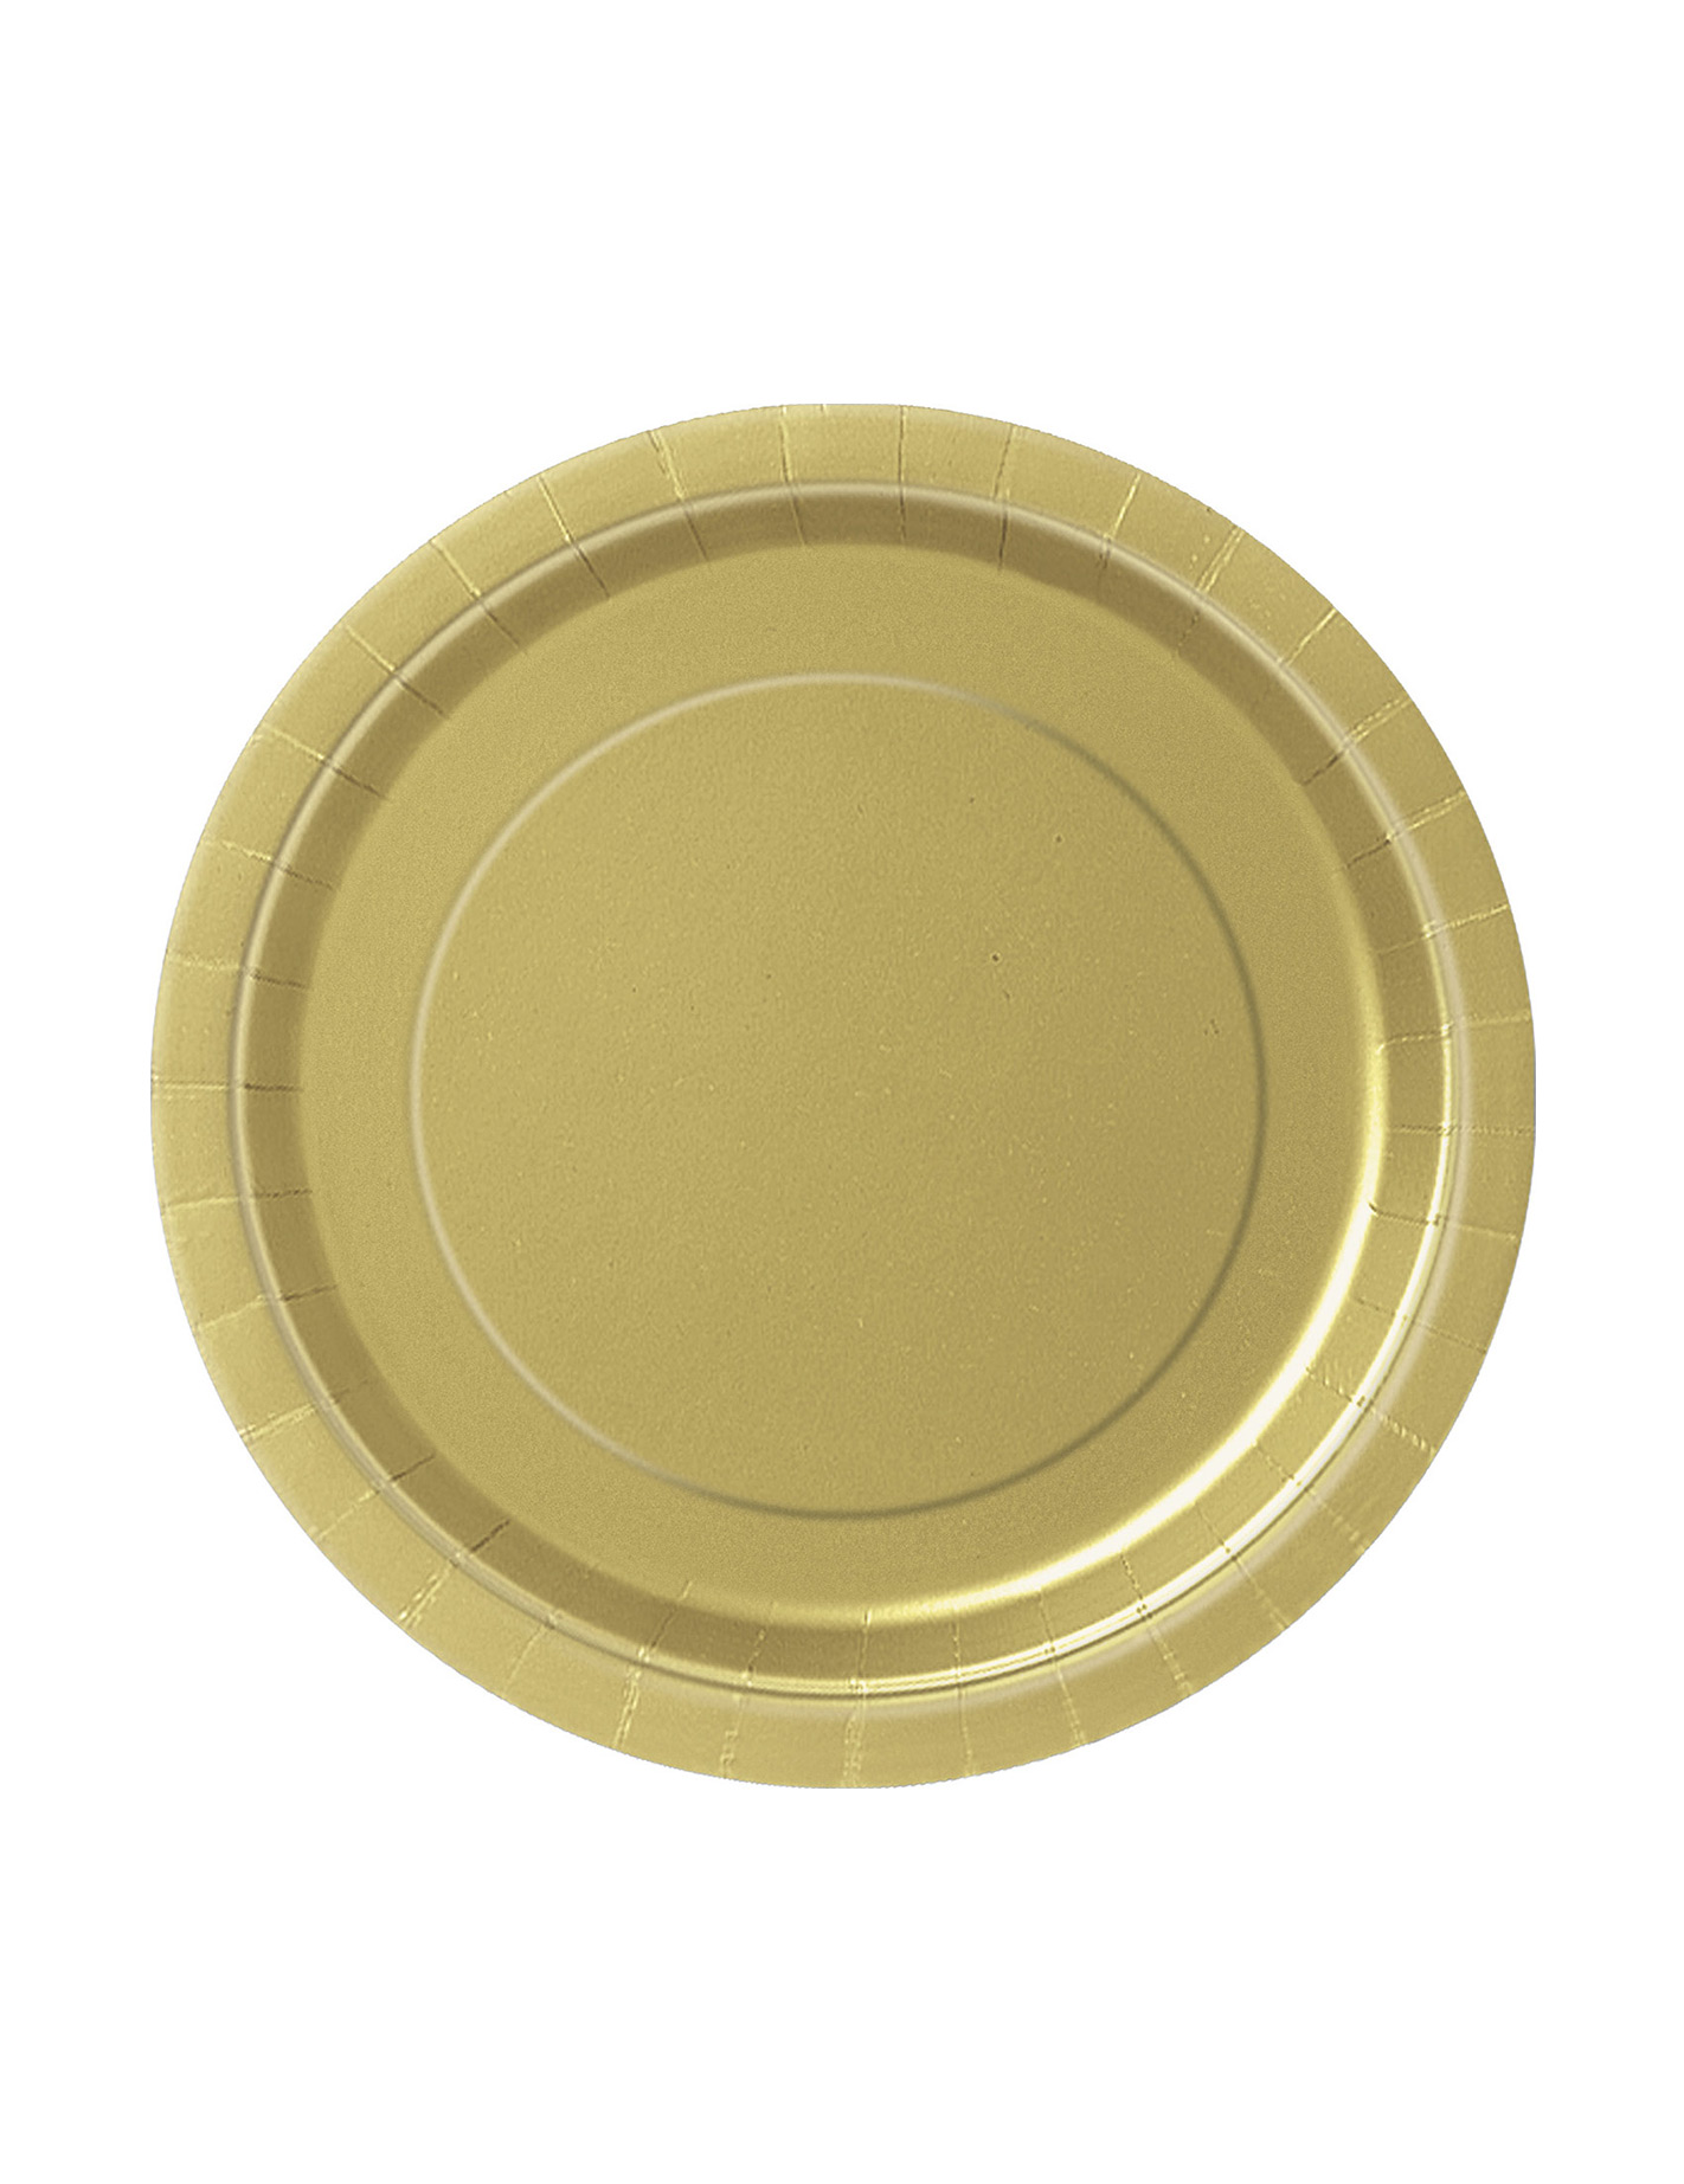 Party pappteller 20 st ck gold 18cm g nstige faschings for Pappteller gold